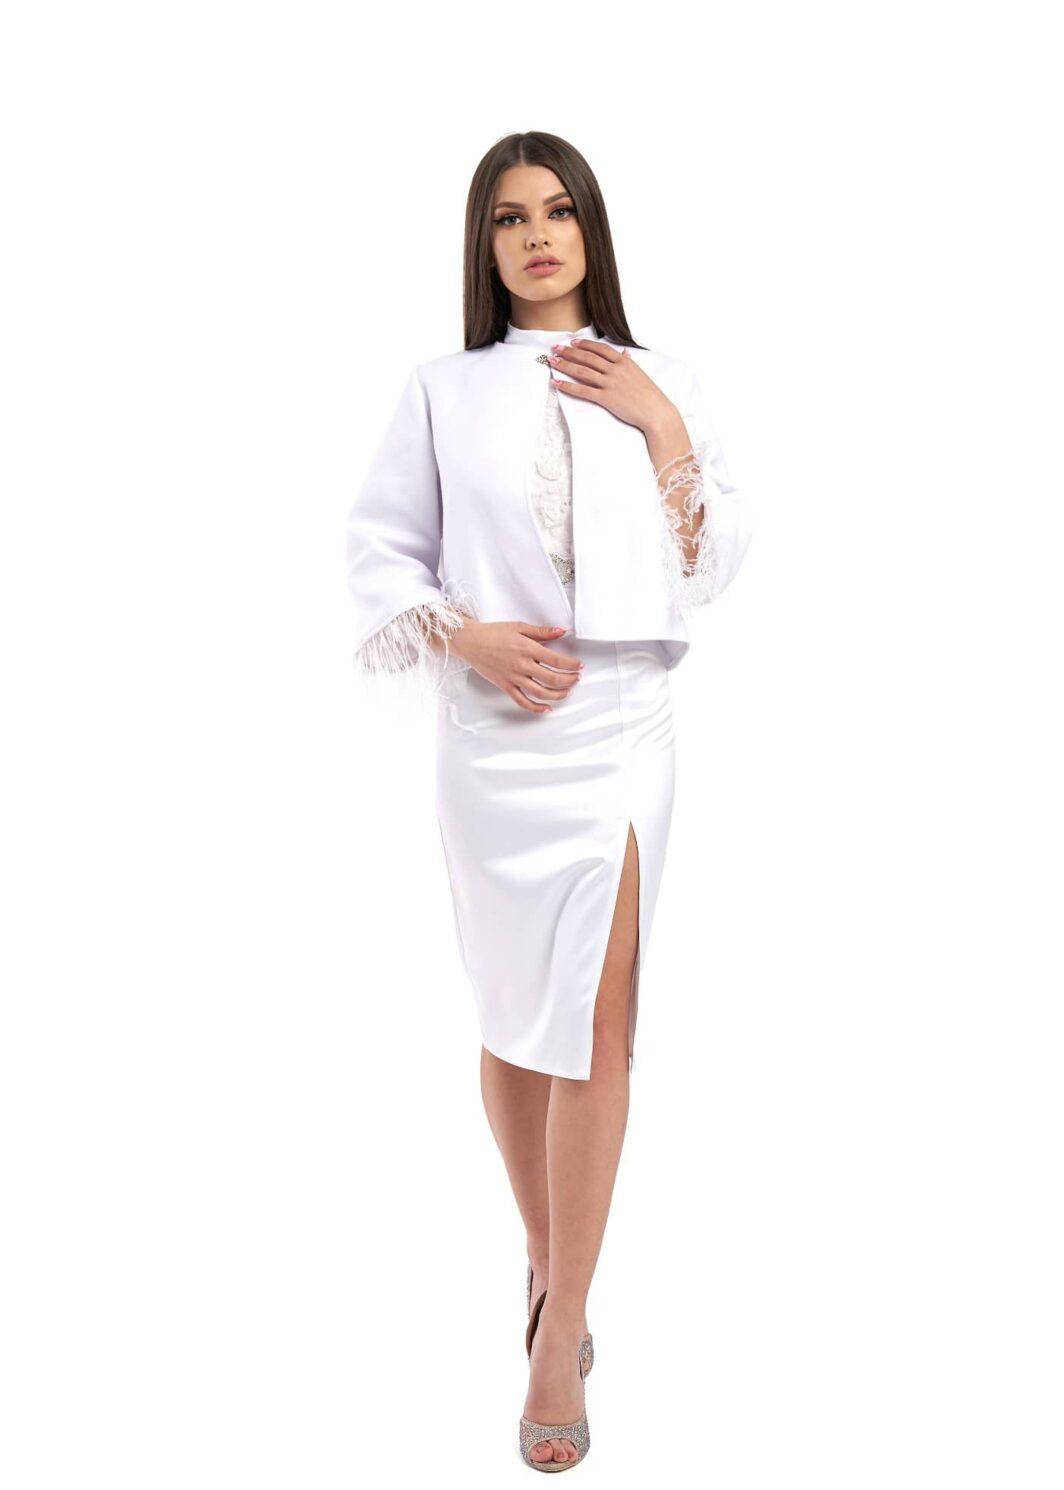 sacou modalaselva alb scurt stofa produs in Romania